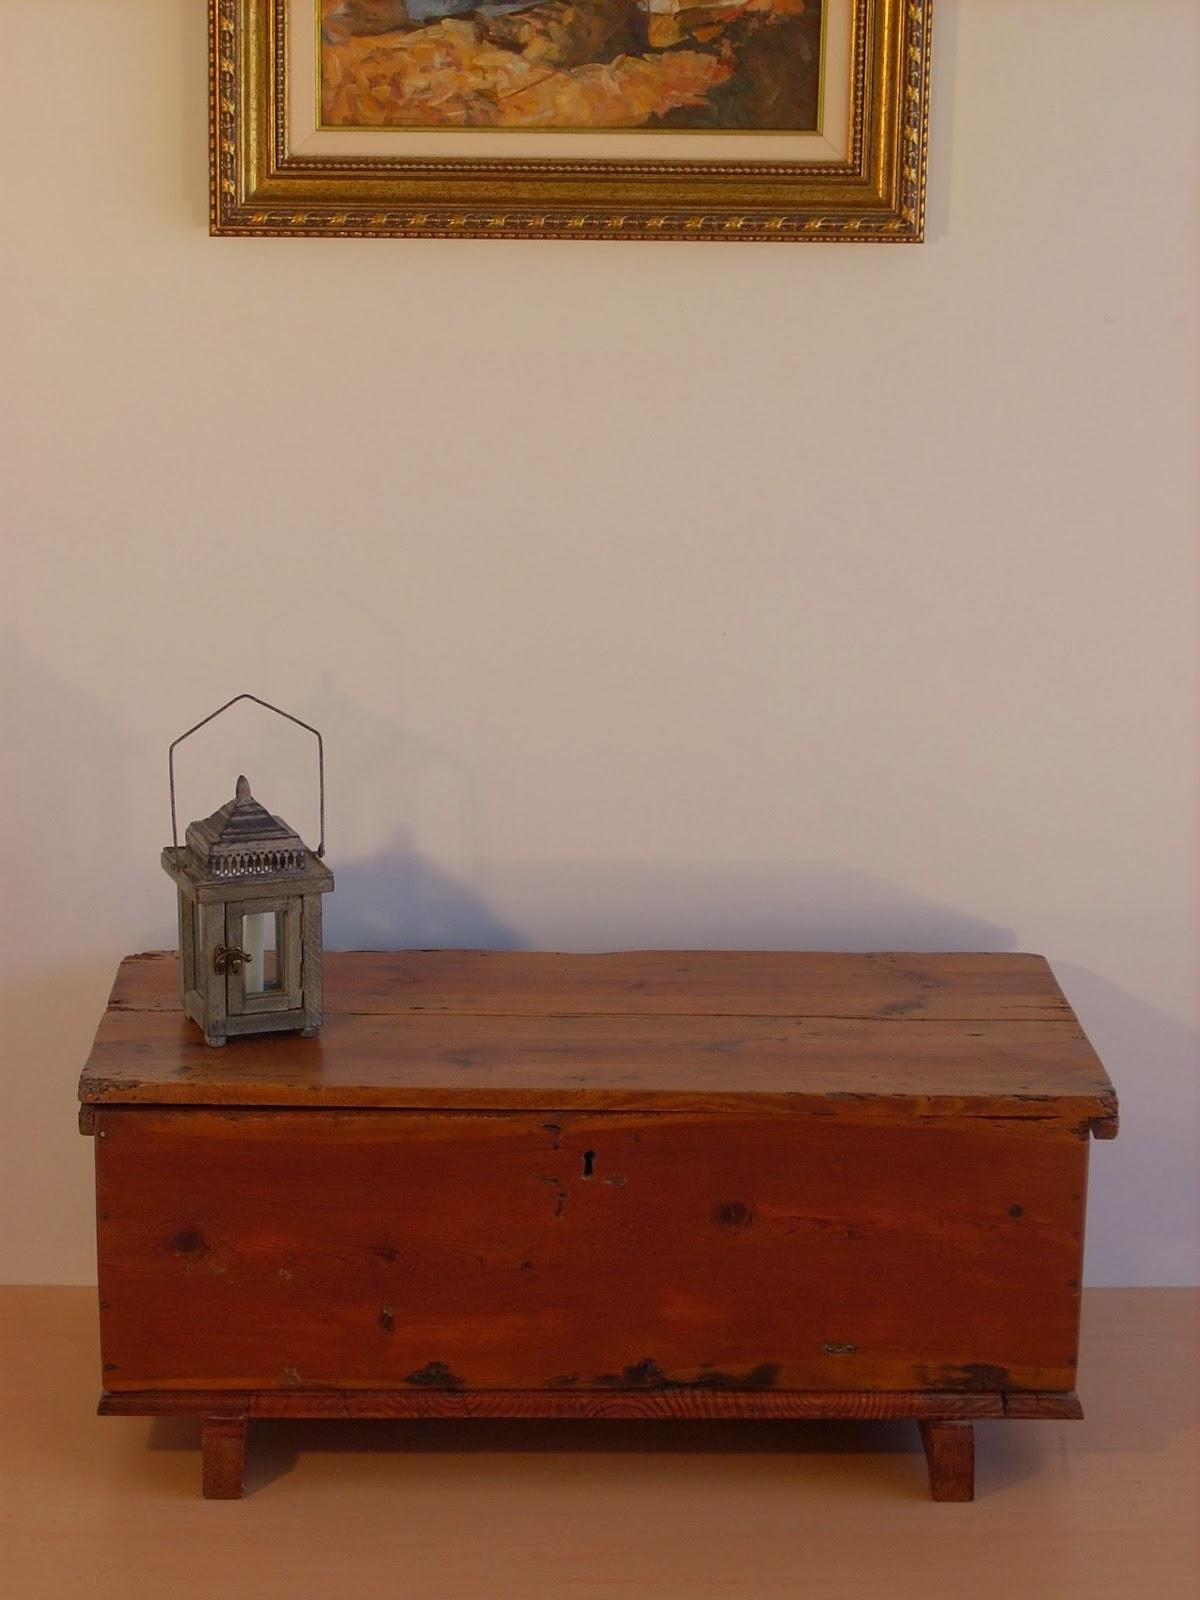 Venta de muebles antiguos restaurados naturmoble caja de - Comprar muebles antiguos ...